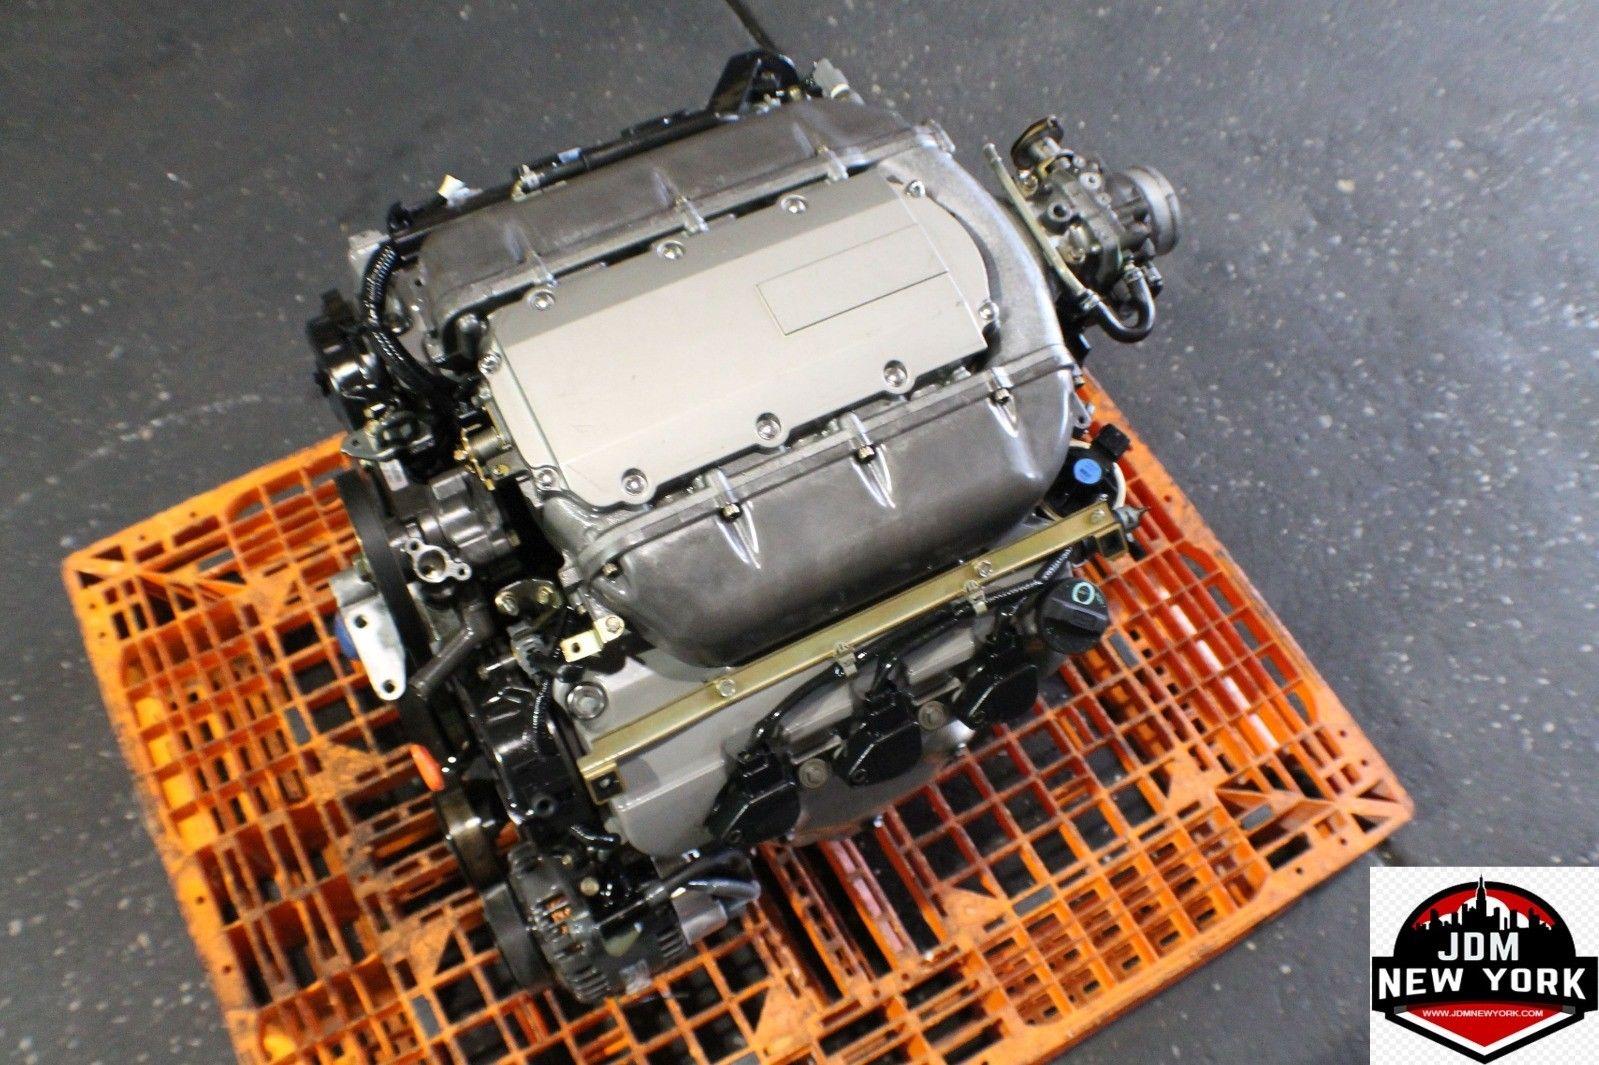 2002 2003 Acura Tl Type S 3 2l V6 Sohc Vtec Engine Jdm J32a J32a2 Jdm New York